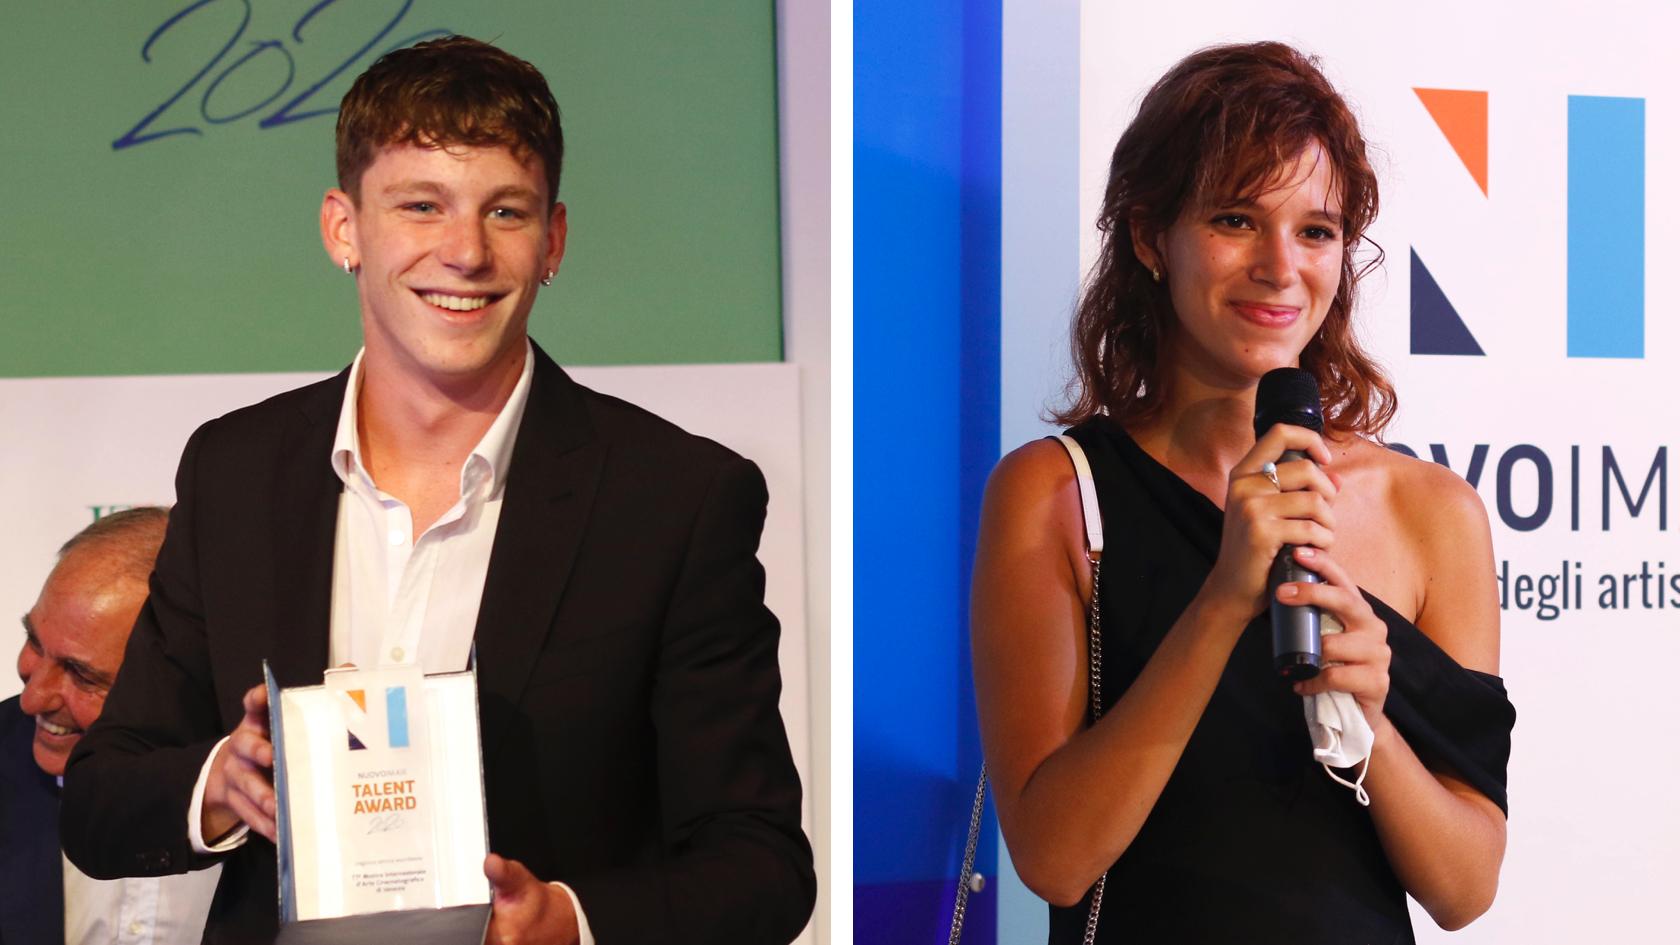 NUOVO IMAIE Talent Award 2020 a Luka Zunic ed Eleonora De Luca